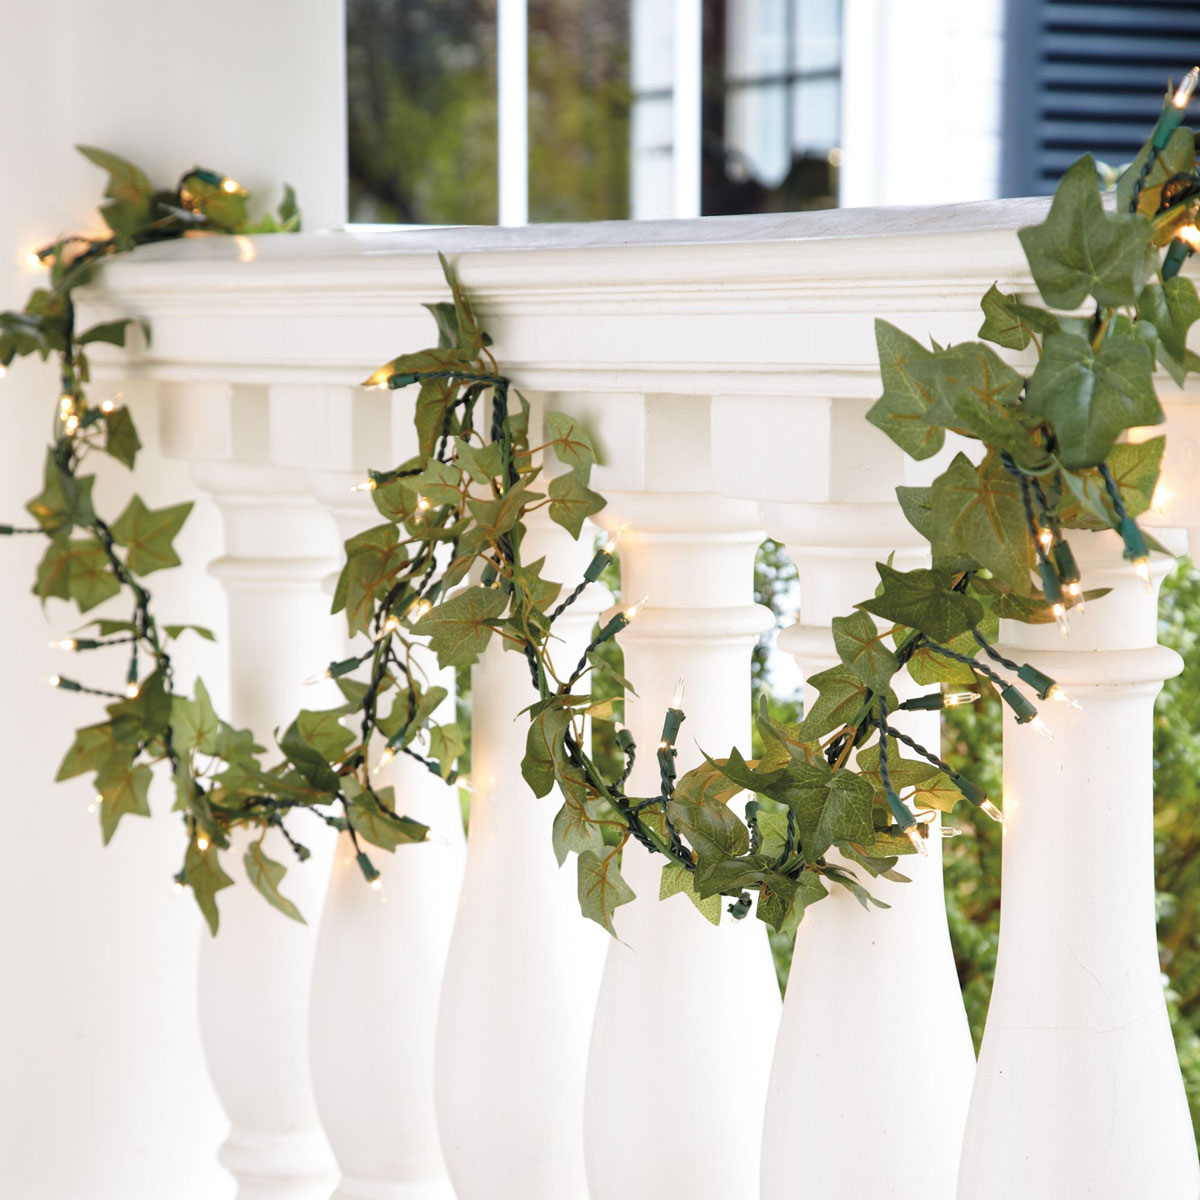 Ivy String Lights - The Green Head